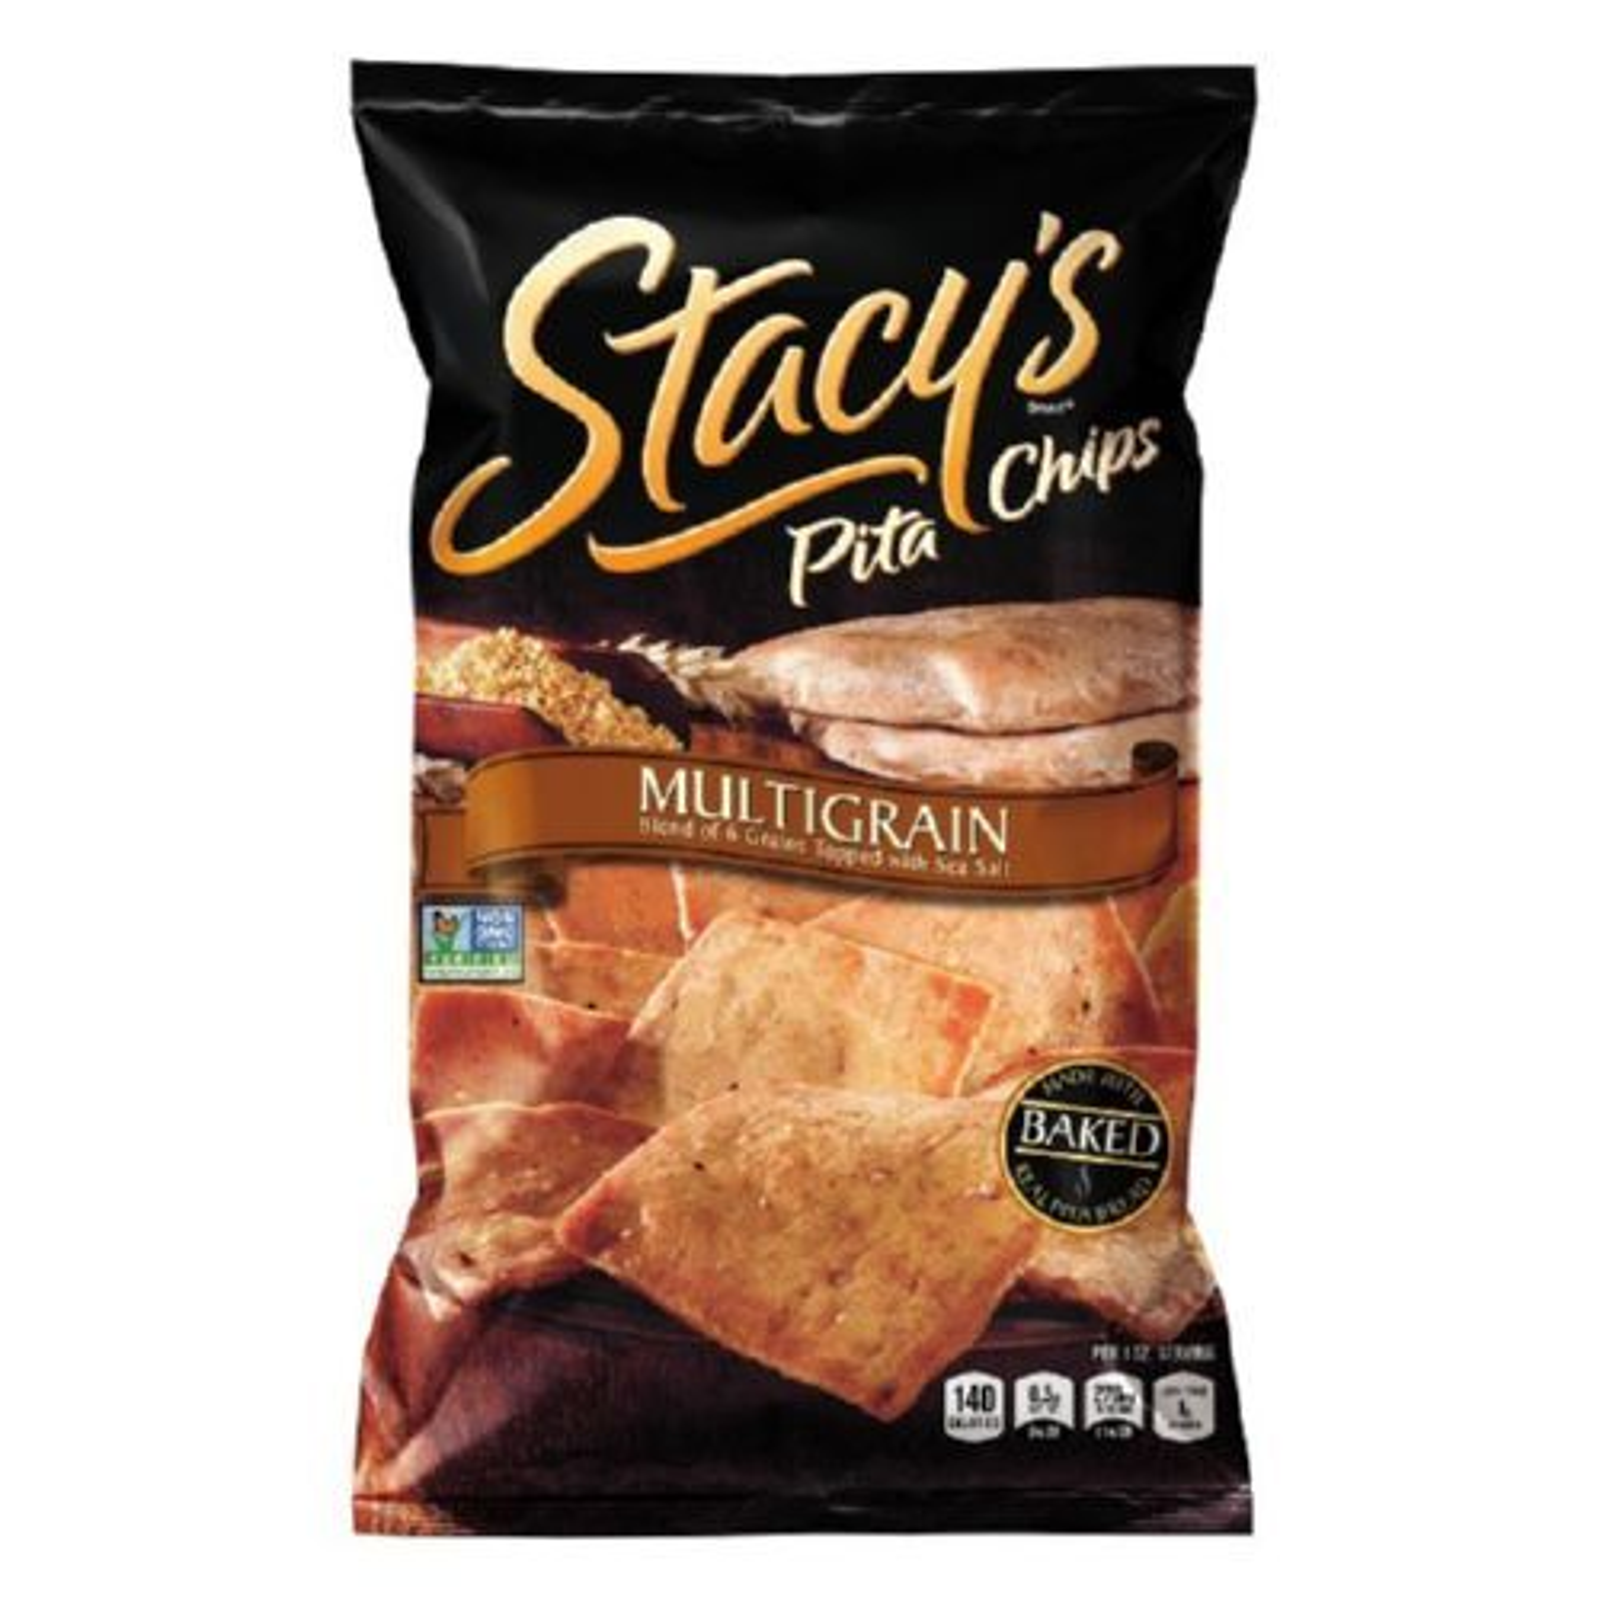 Stacey's Pita Chips - Multigrain - 7.33 oz - Case of 12